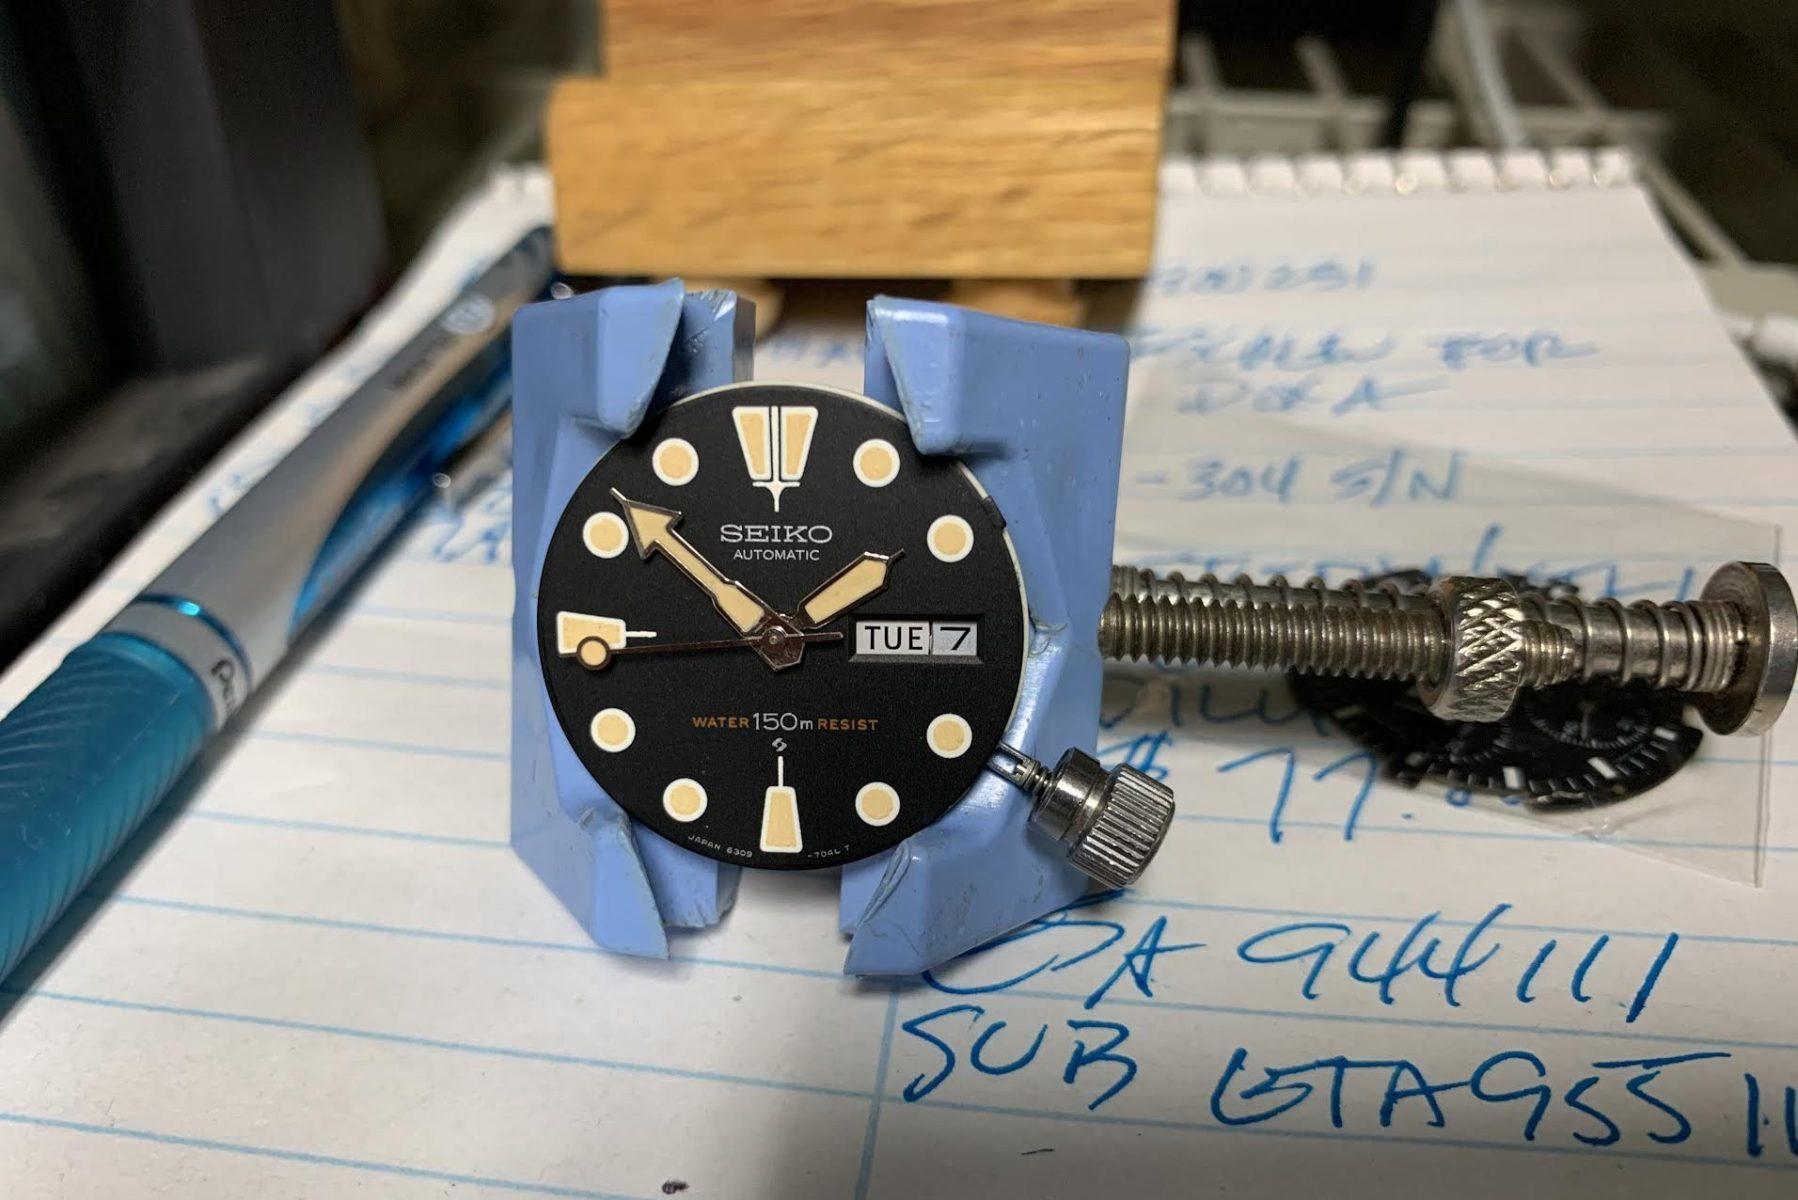 A Seiko watch is modified i